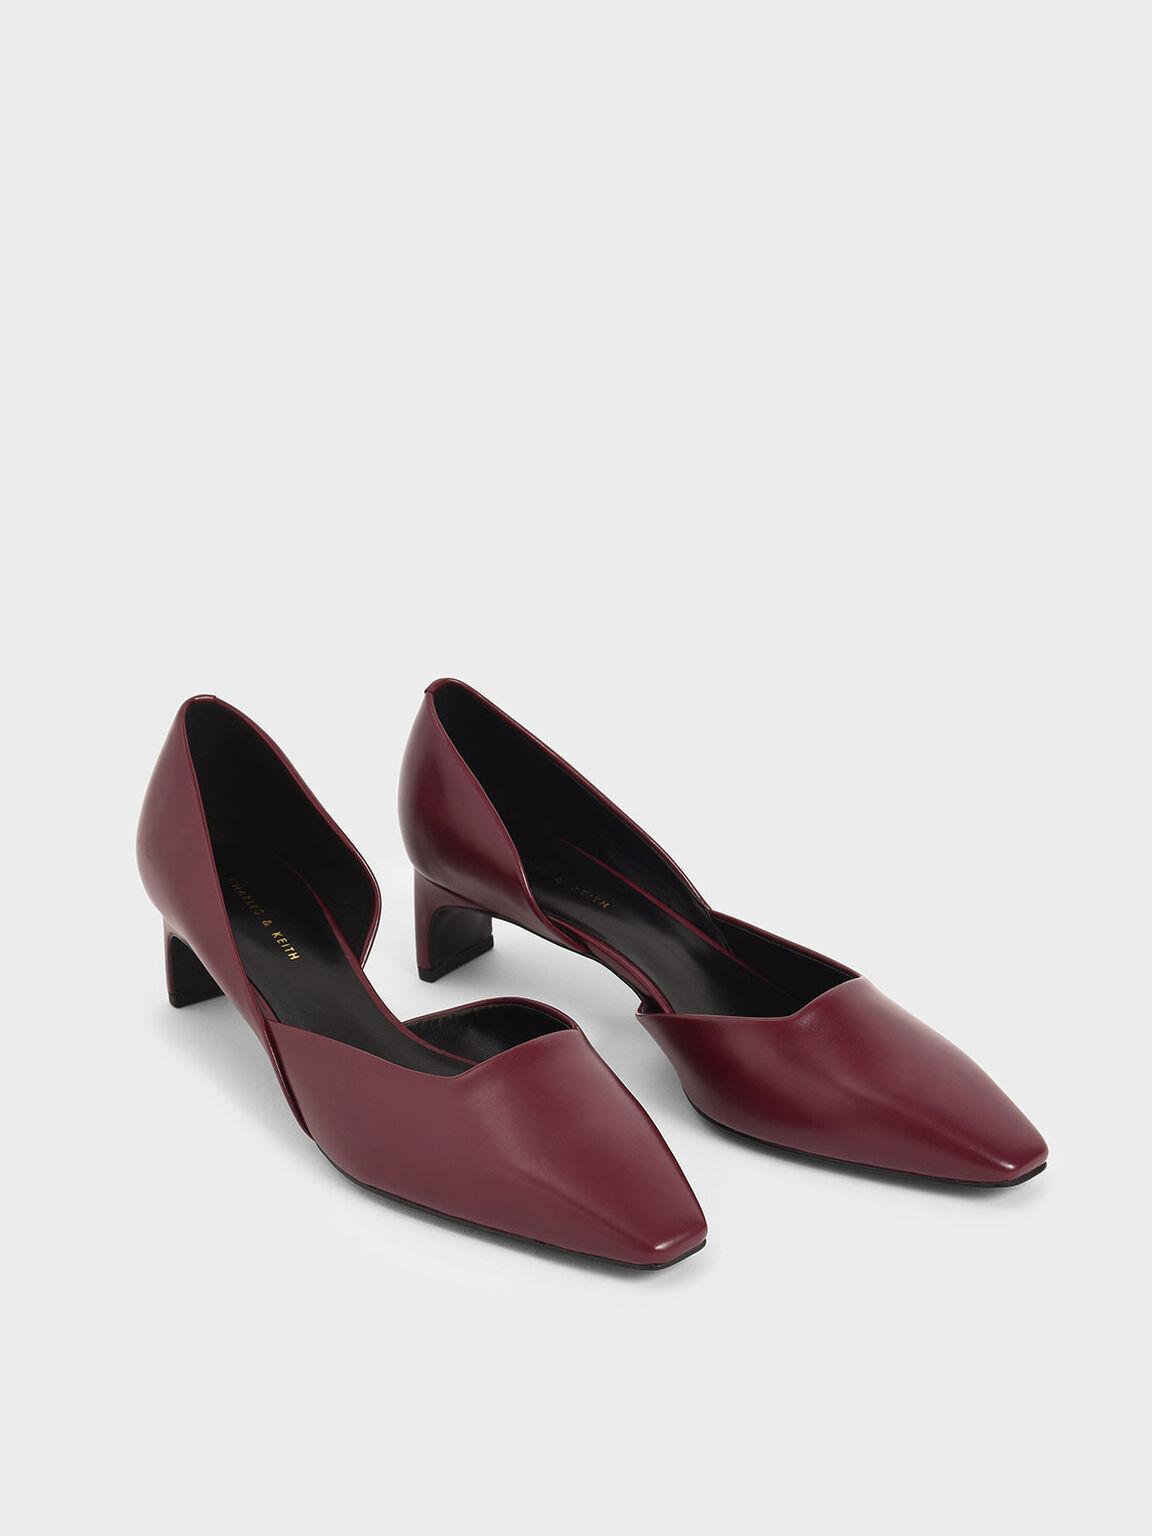 Square Toe D'Orsay Court Shoes, Burgundy, hi-res